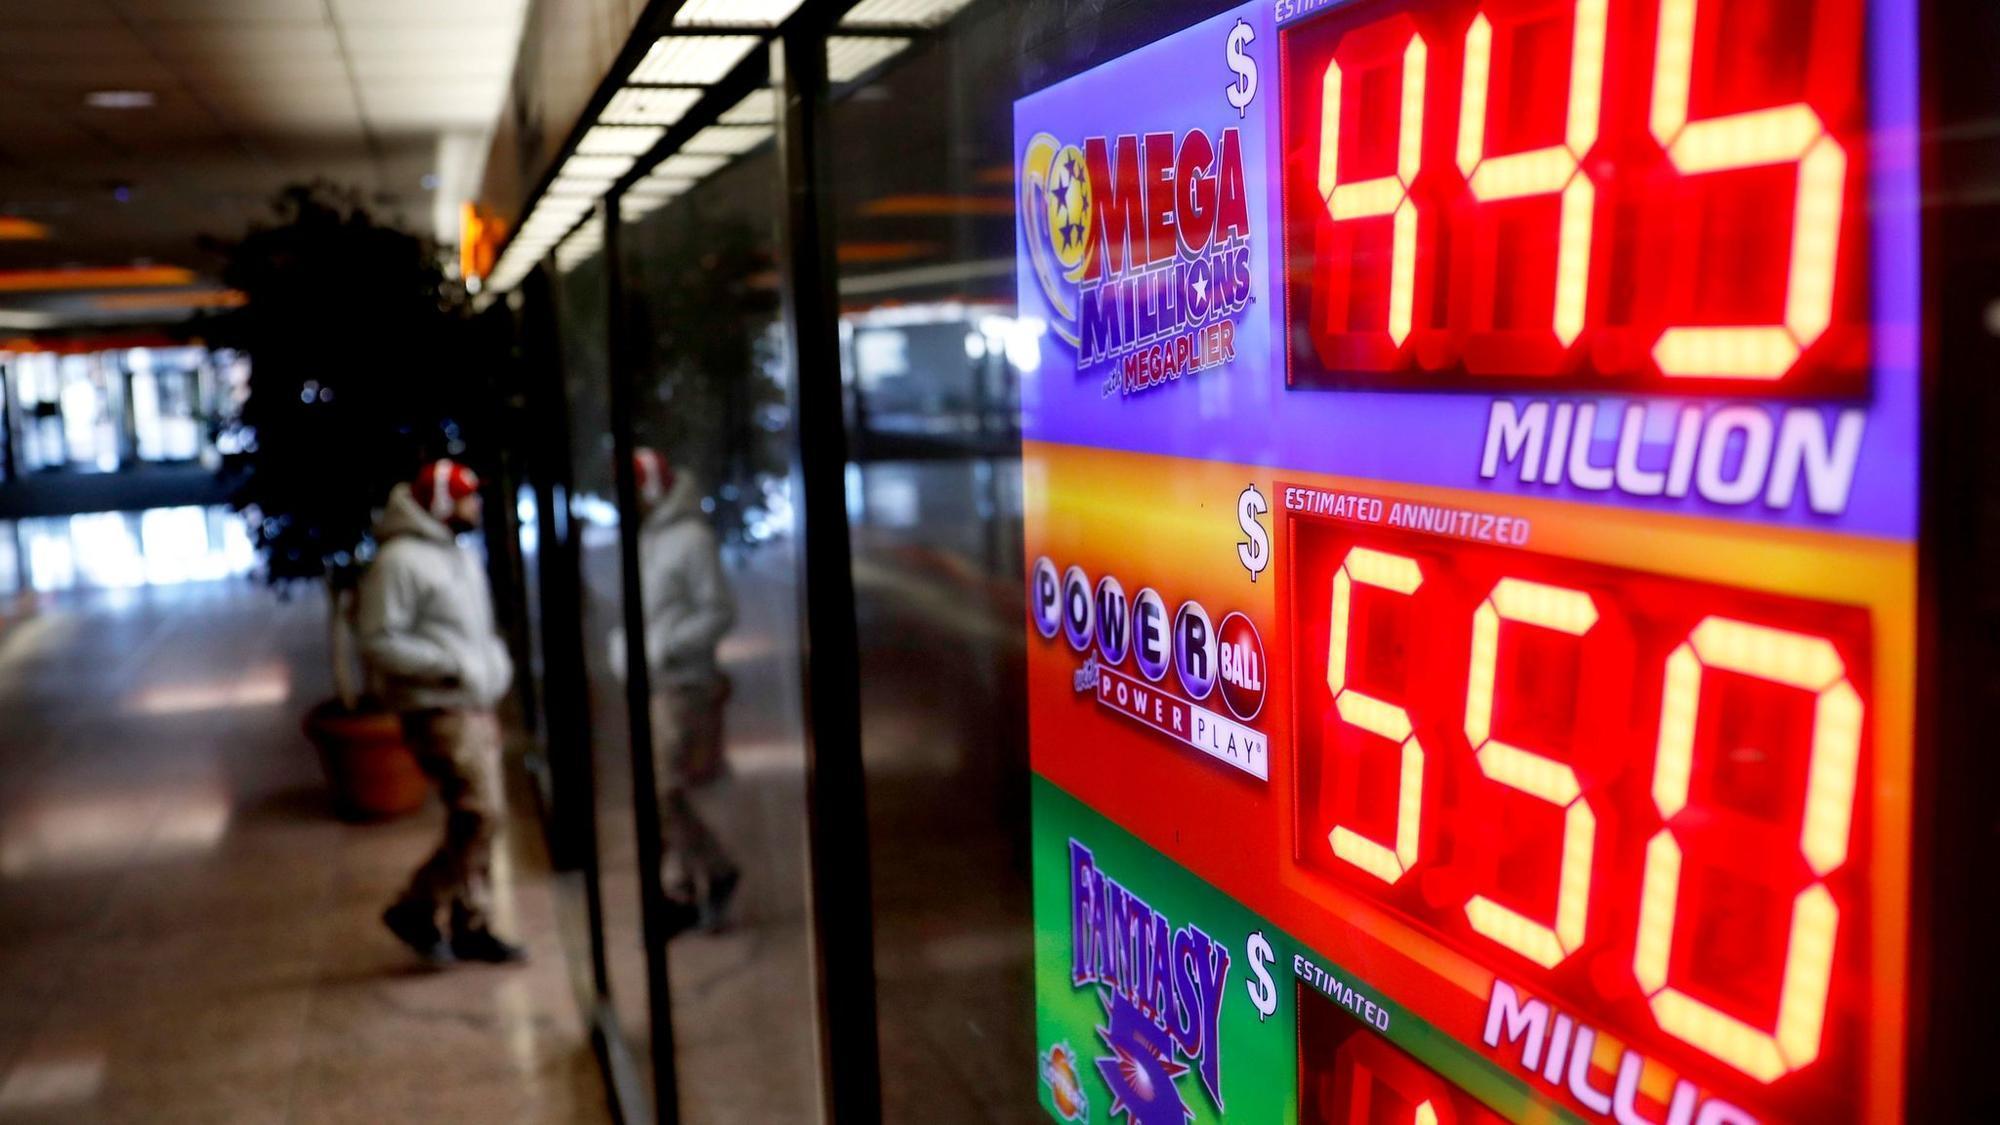 20-year-old Mega Millions jackpot winner hopes to do 'good ...